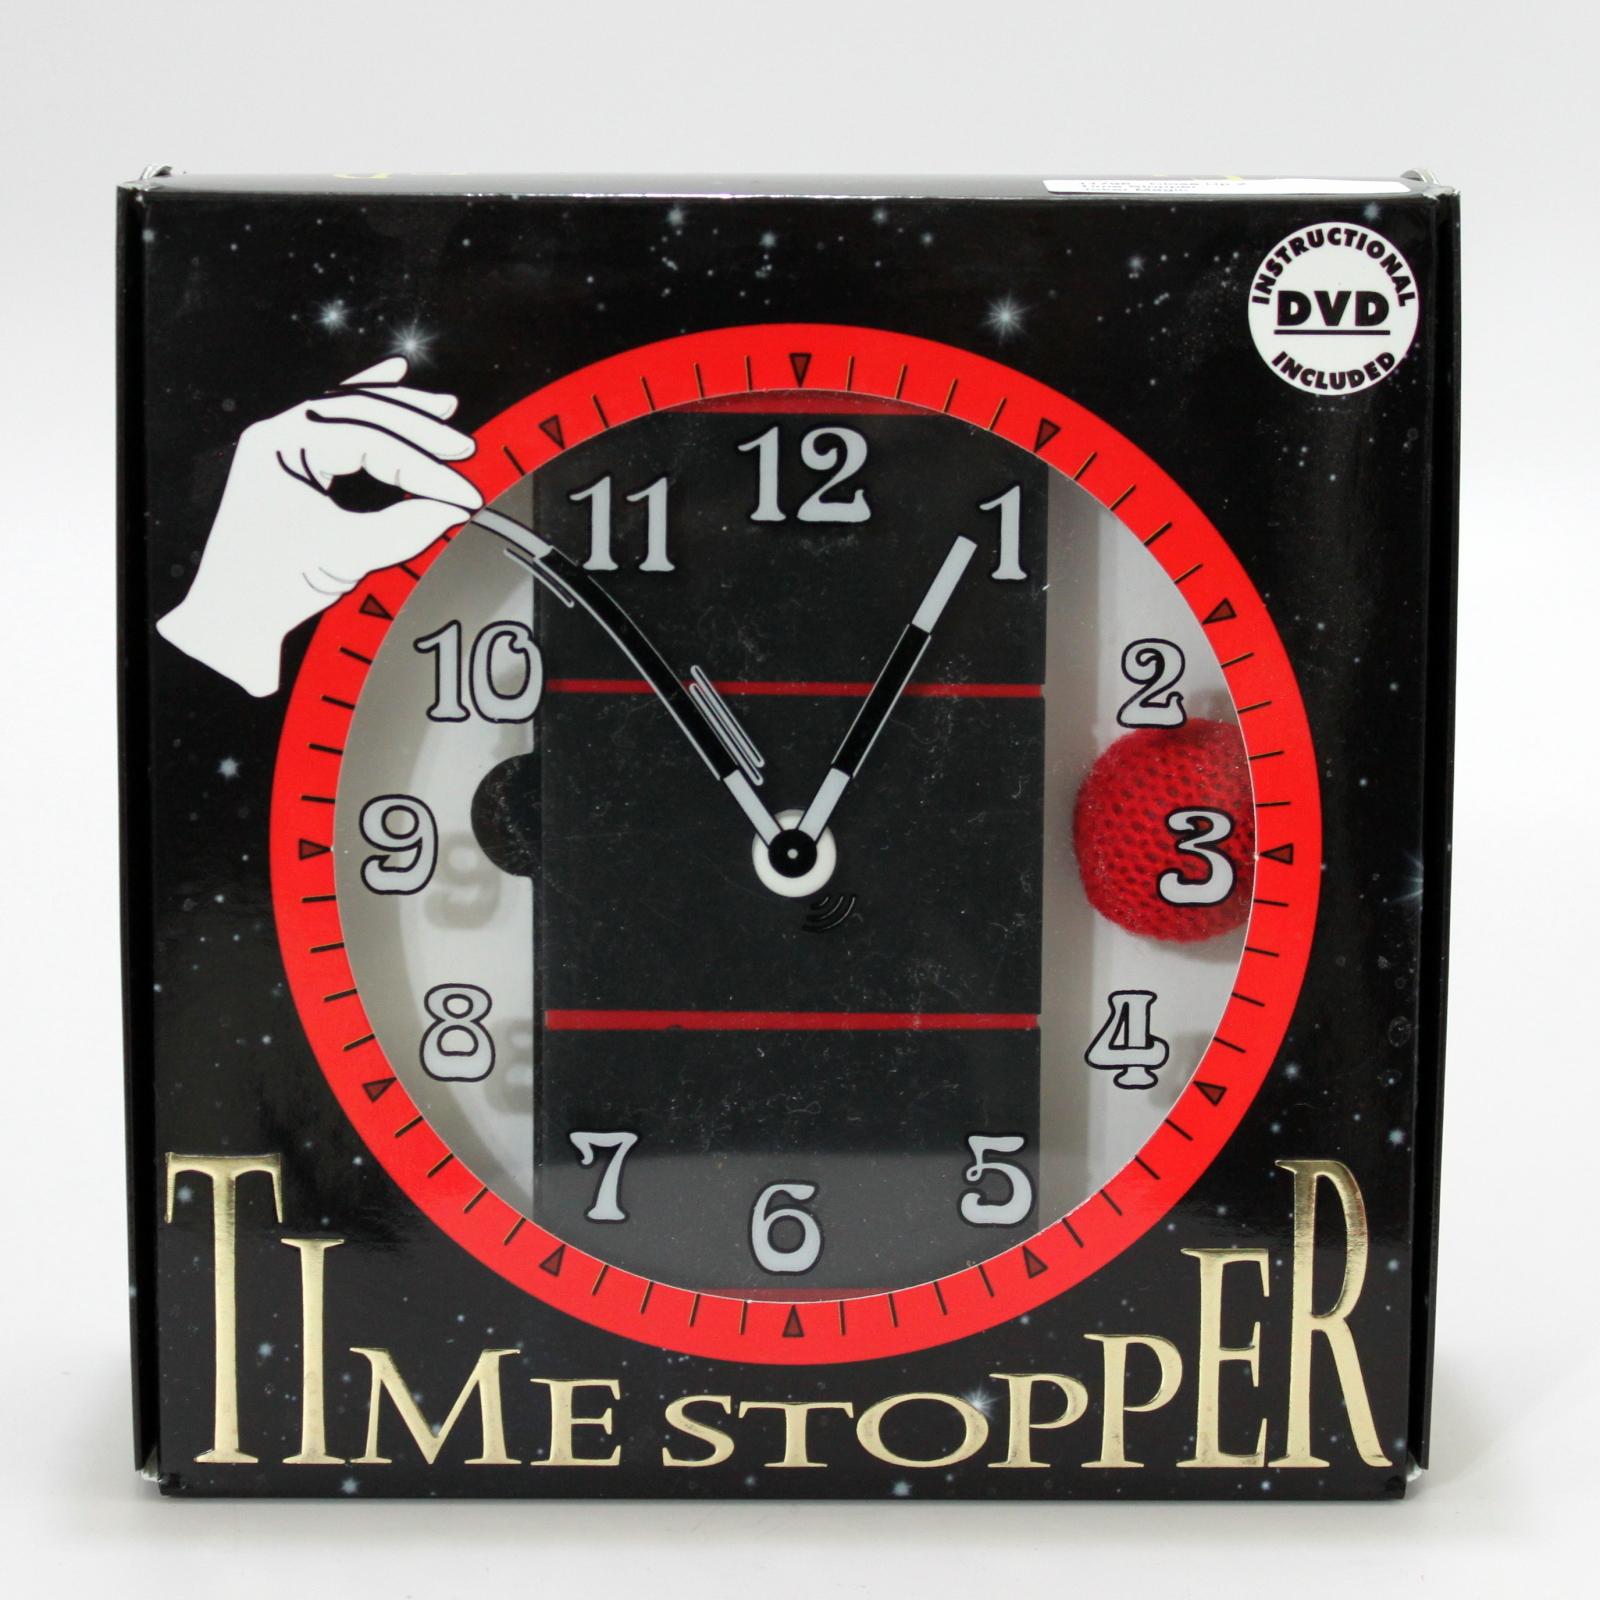 Time Stopper by Joker Magic